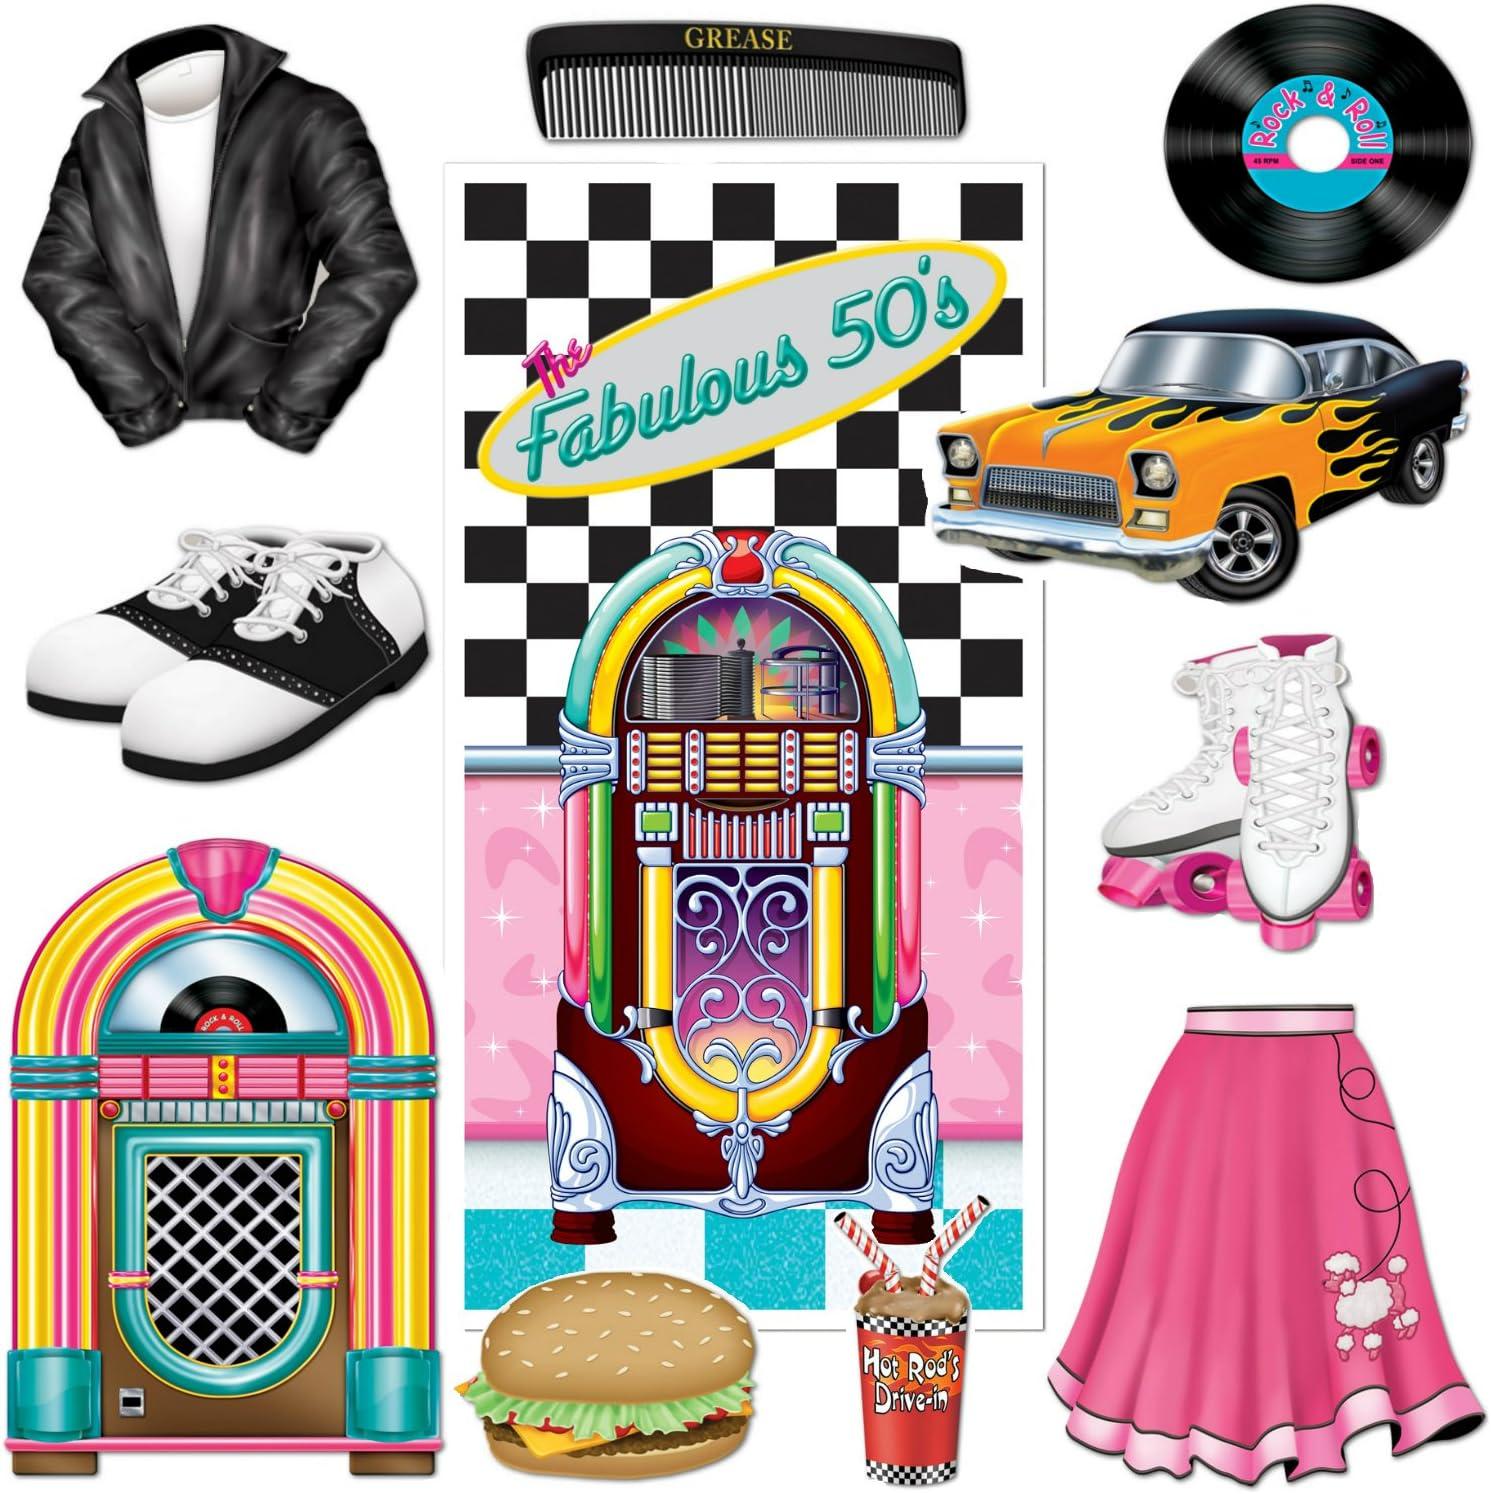 1256 * t-shirt kustom hot rod 50s MUSICBOX vintage Chop car JUKEBOX motif